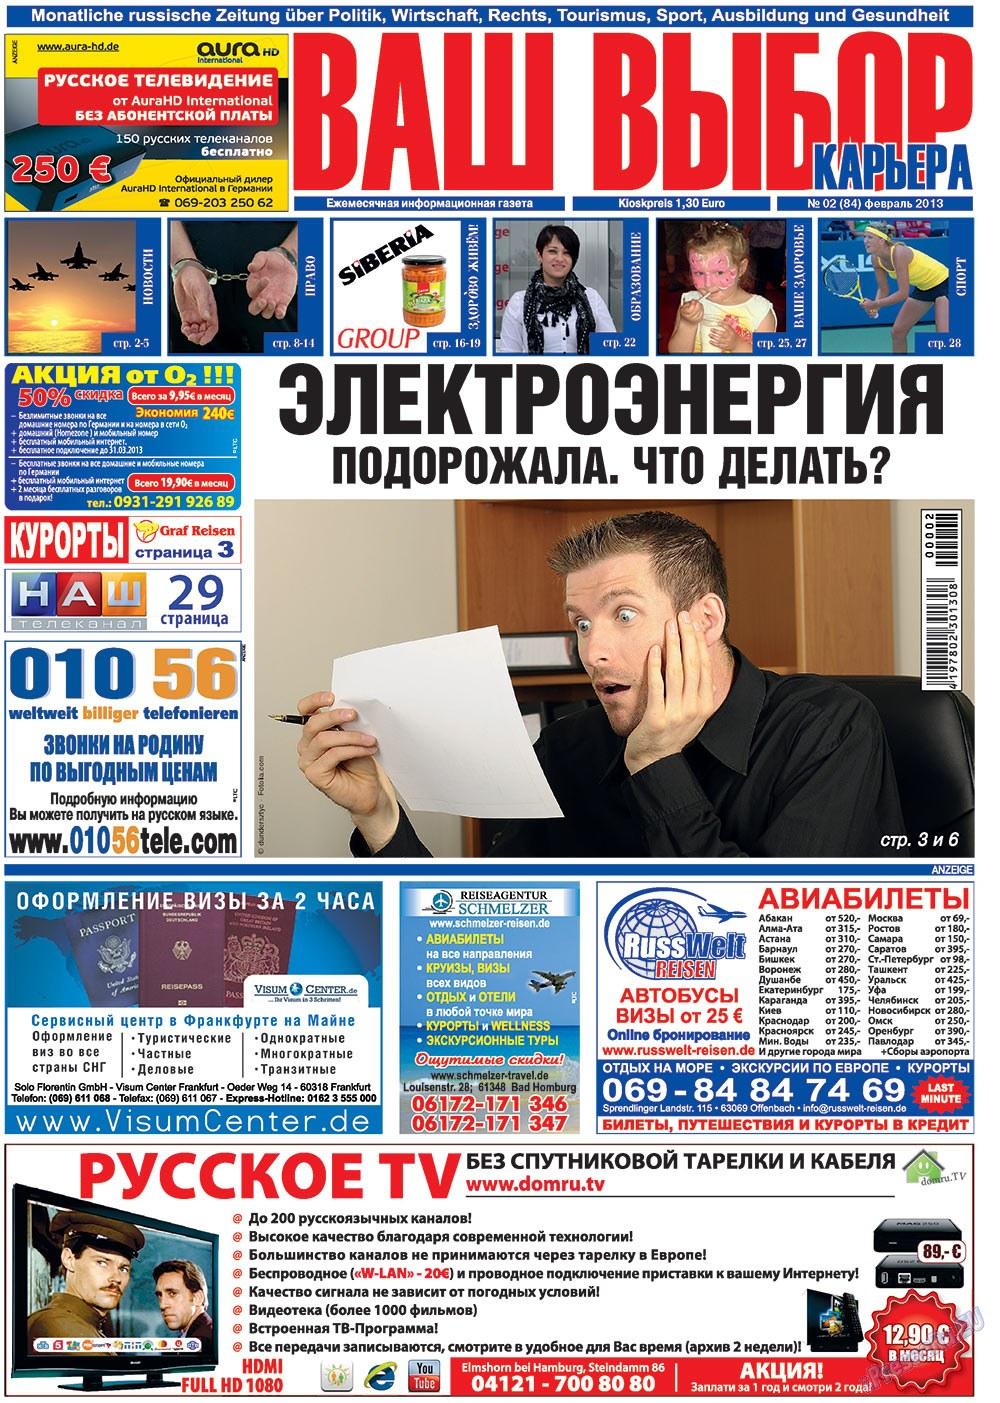 Карьера (газета). 2013 год, номер 2, стр. 1